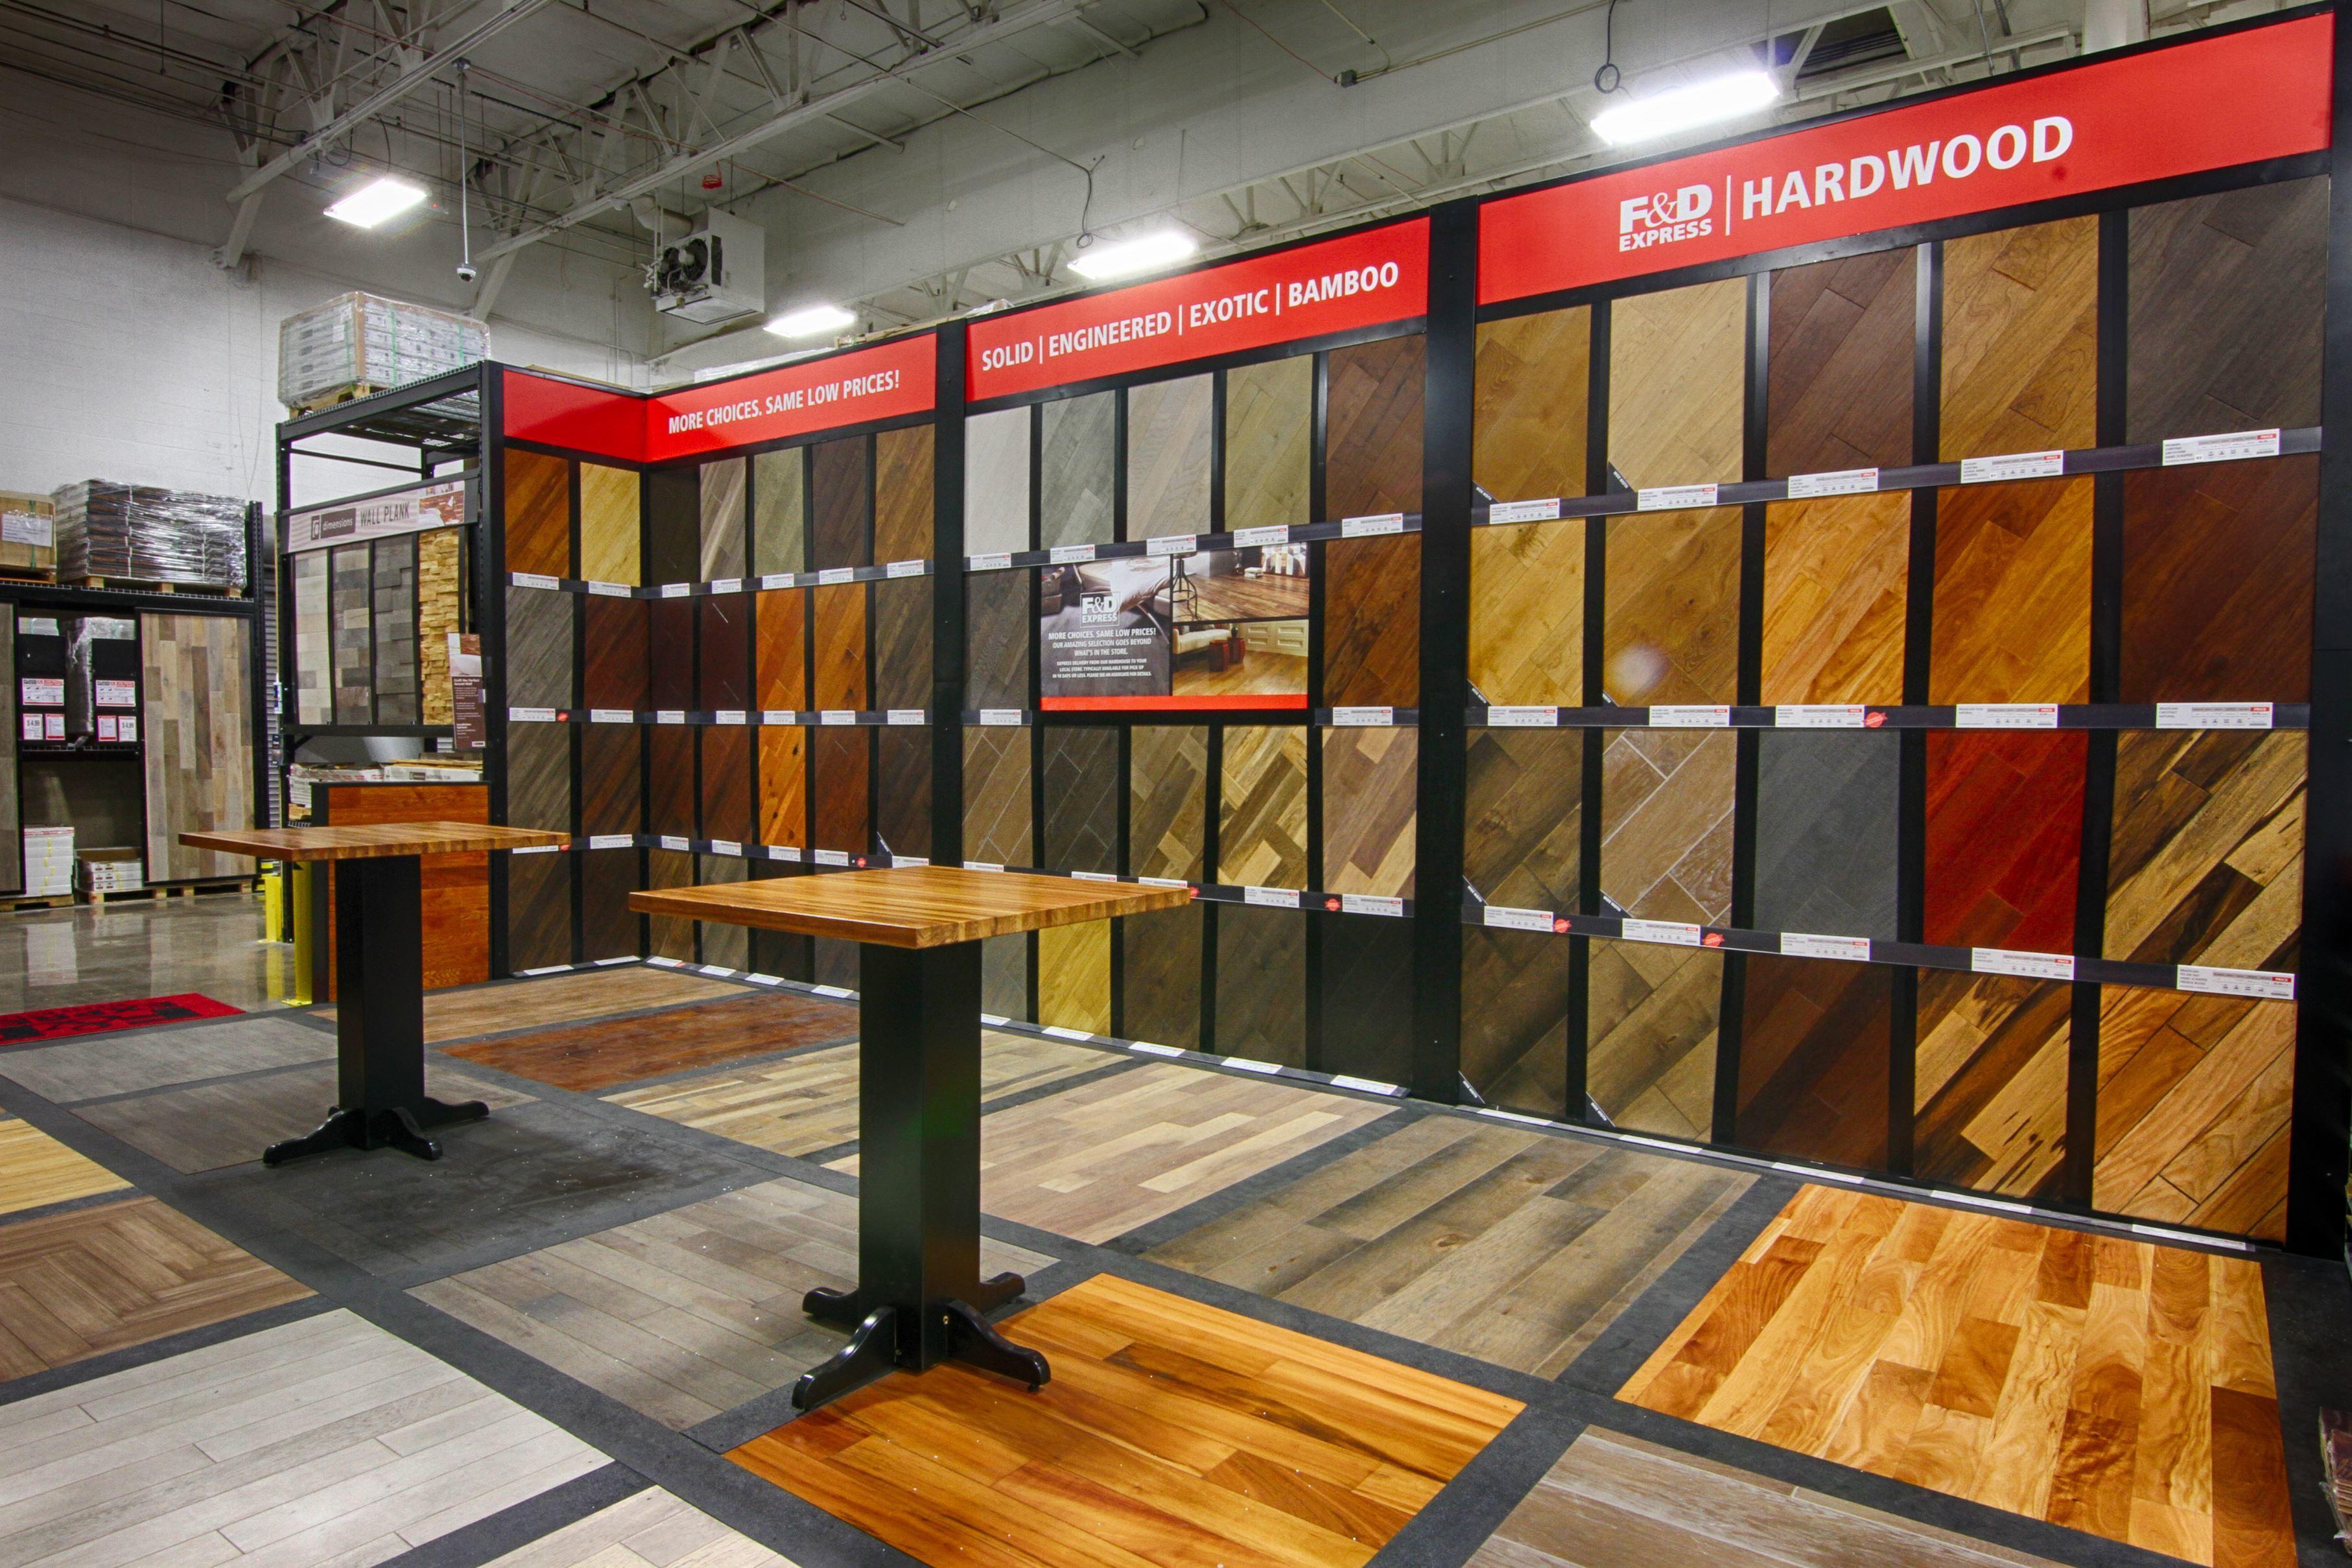 bamboo hardwood flooring prices of floor decor 5880 w bell rd glendale az advertising marketing intended for floor decor 5880 w bell rd glendale az advertising marketing mapquest